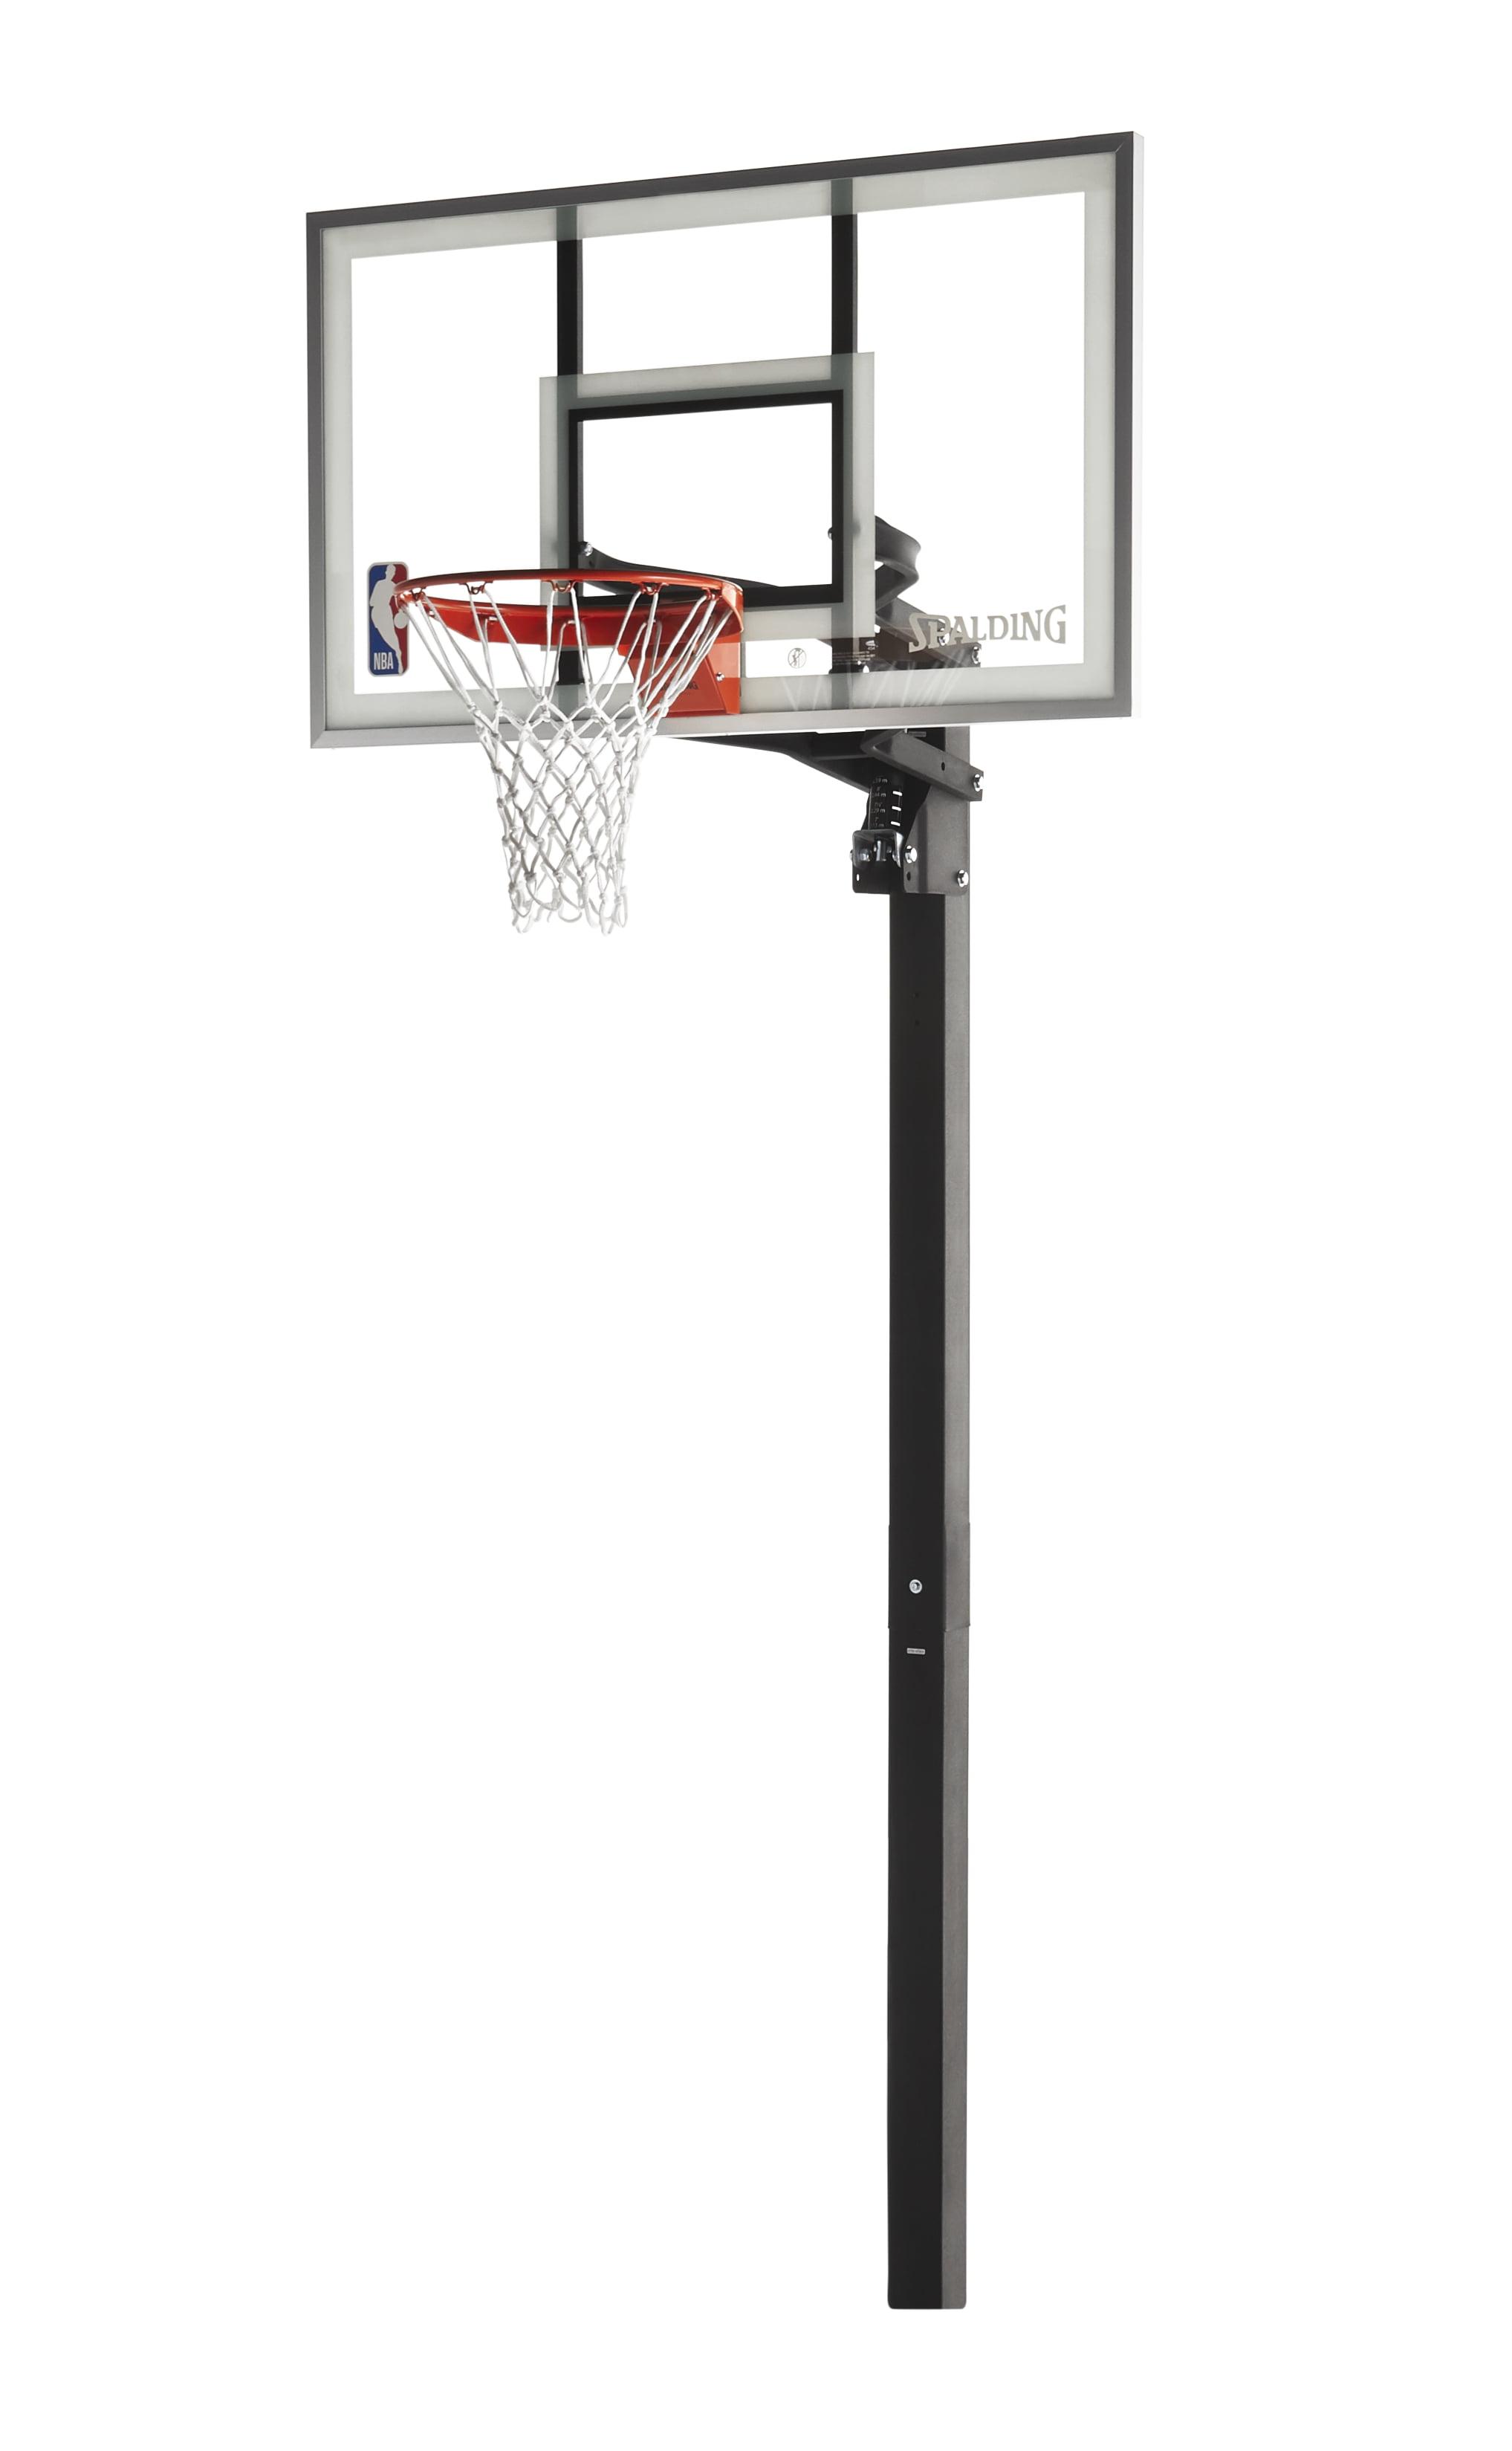 "Spalding NBA 60"" Glass U-Turn In-Ground Hoop System by Spalding"